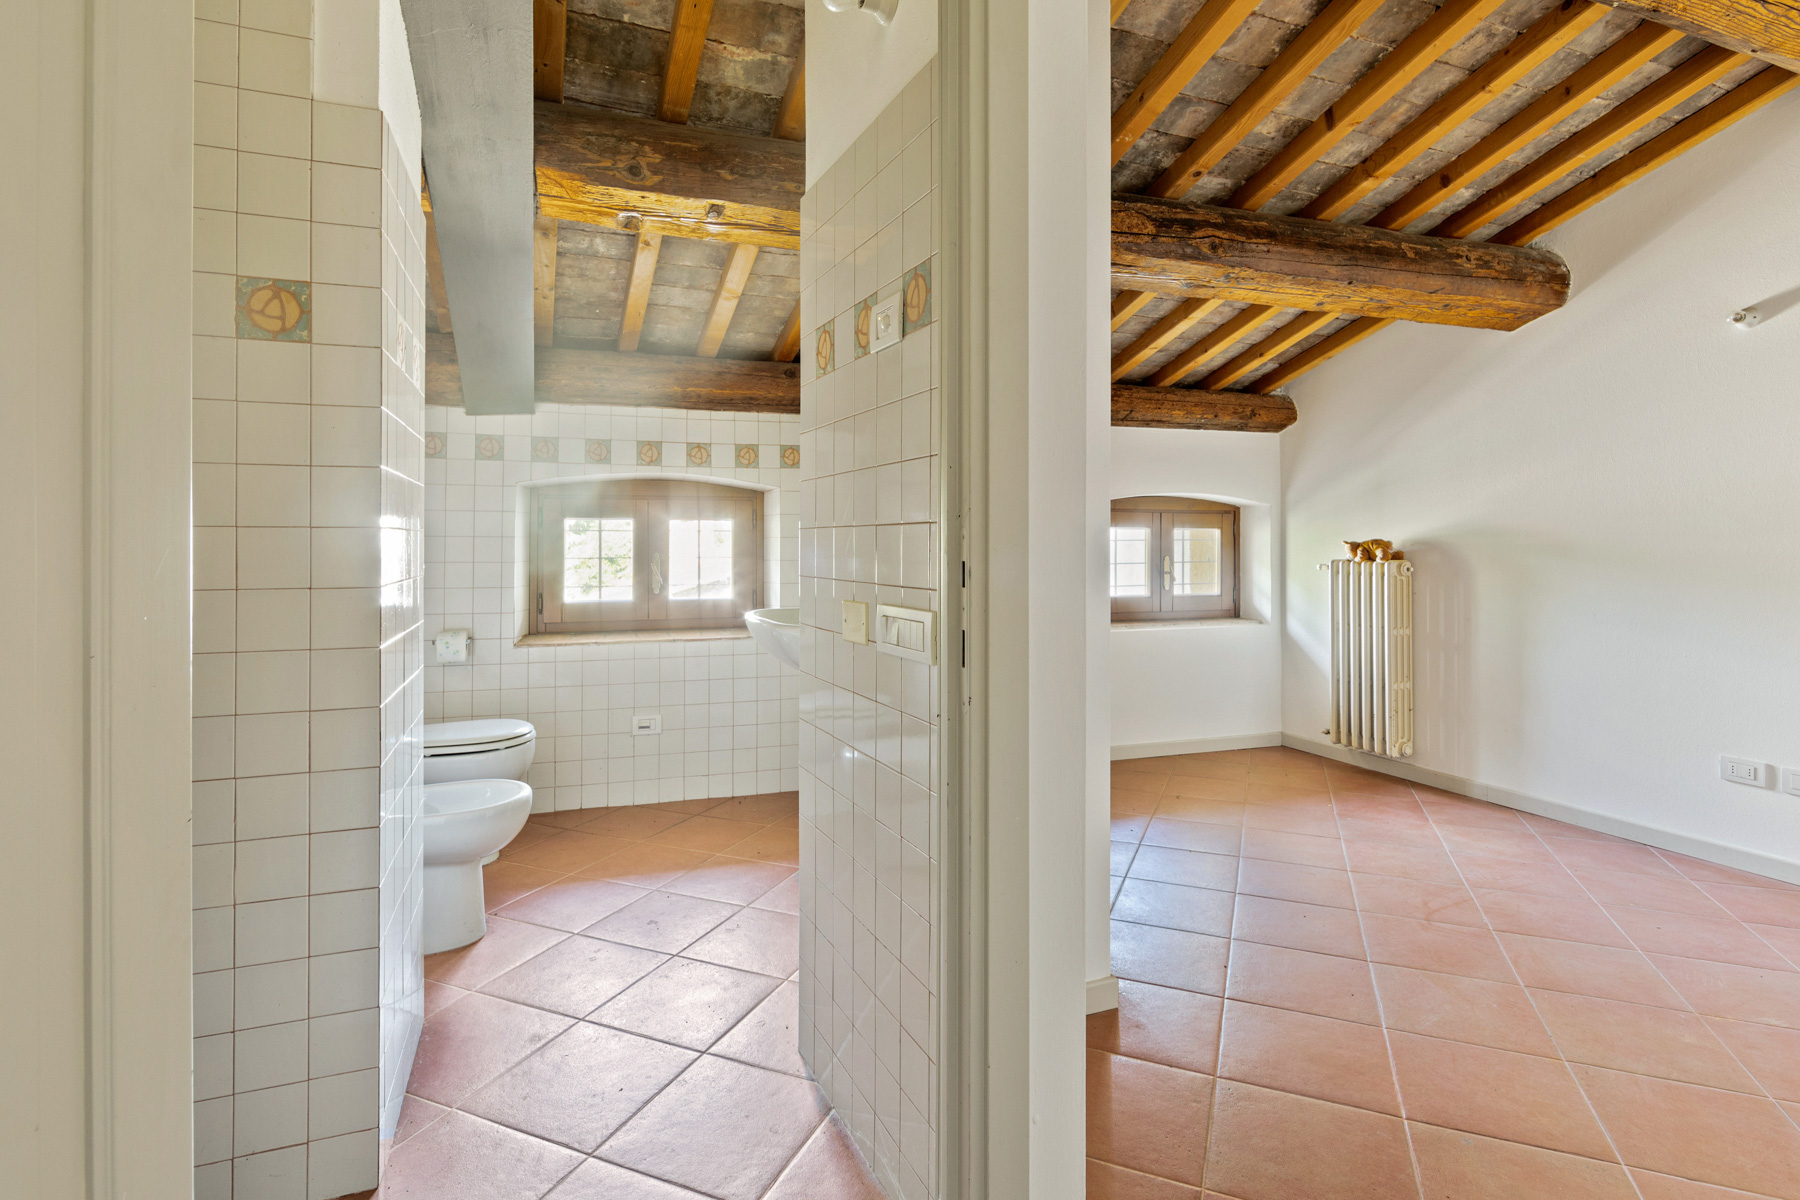 Villa in Vendita a Verona: 5 locali, 890 mq - Foto 20